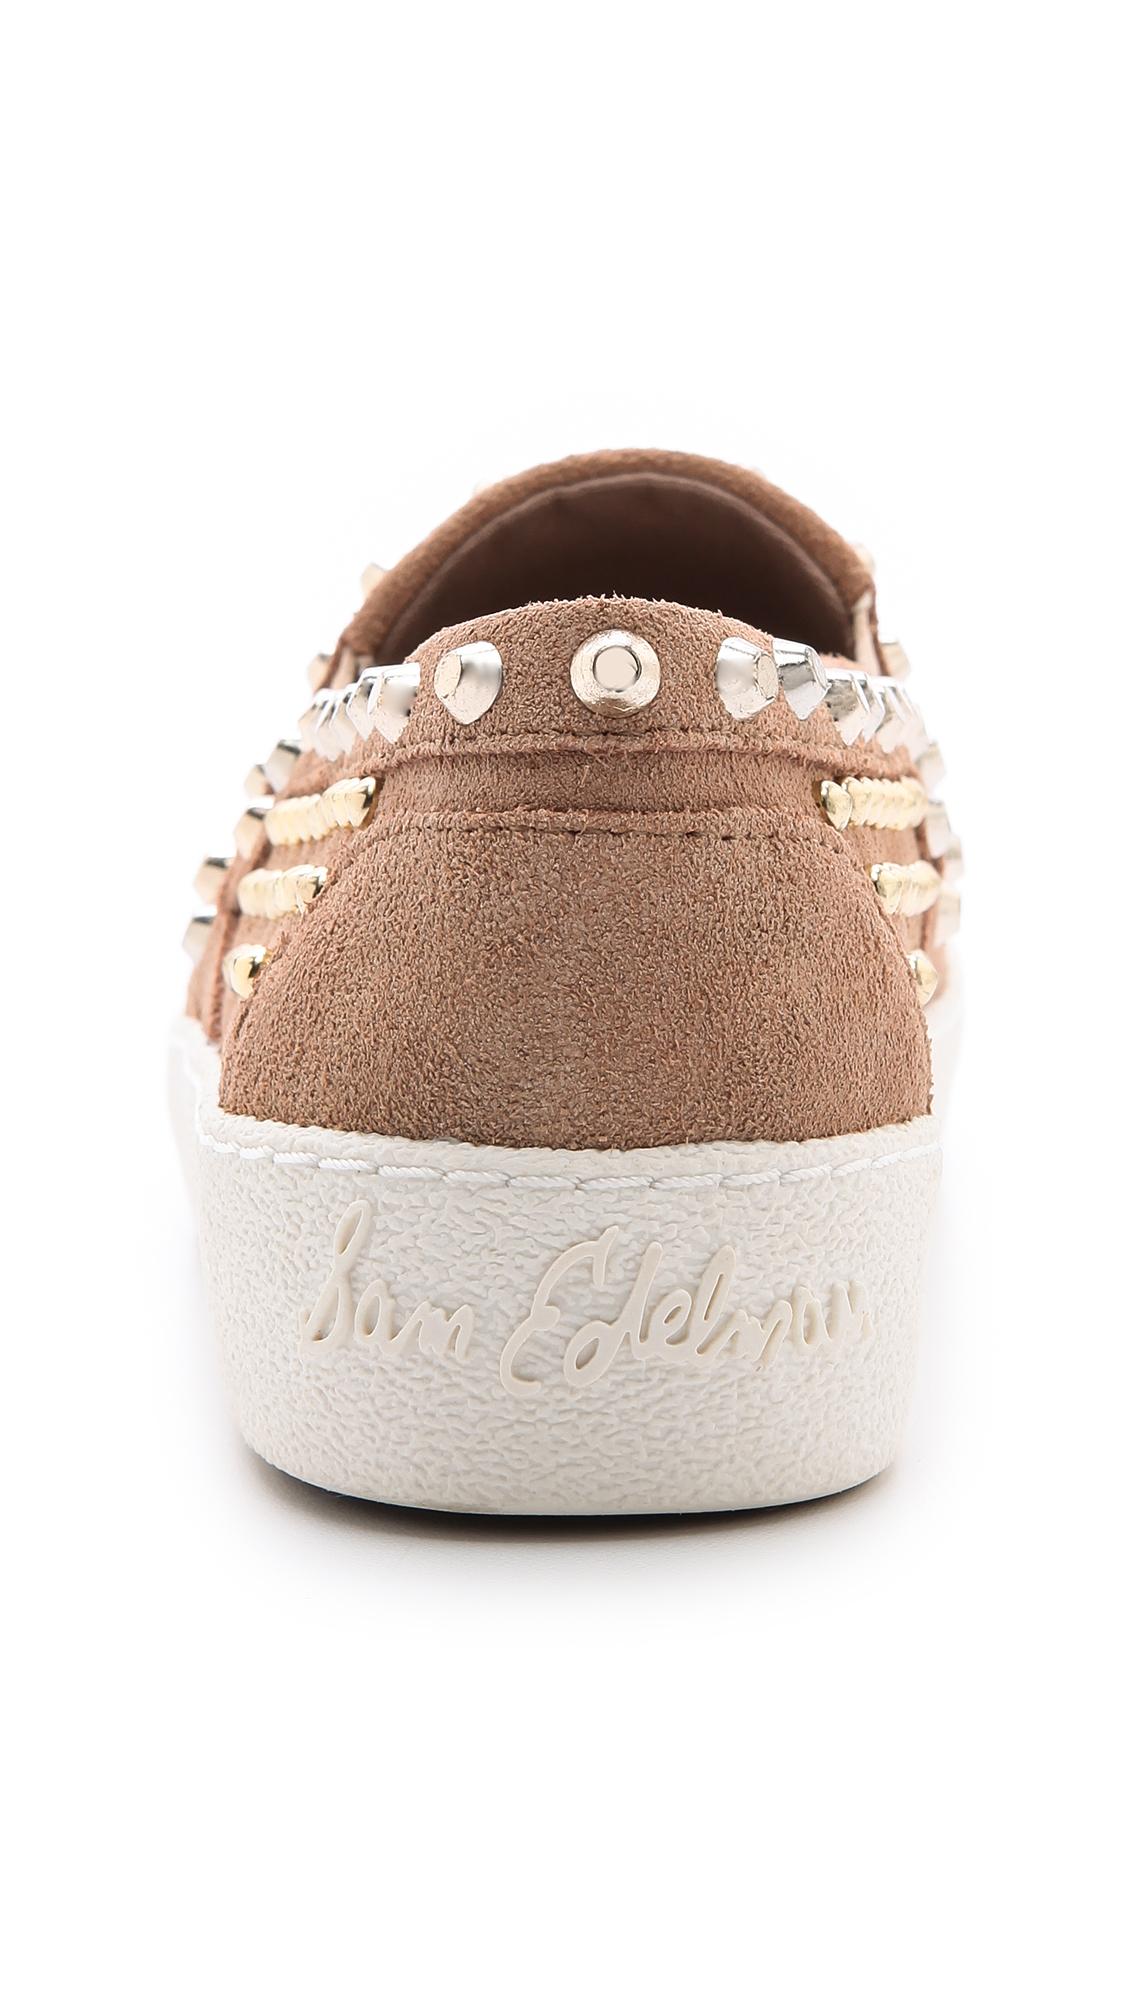 7e400cd1e2b199 Sam Edelman Braxton Studded Slip On Sneakers